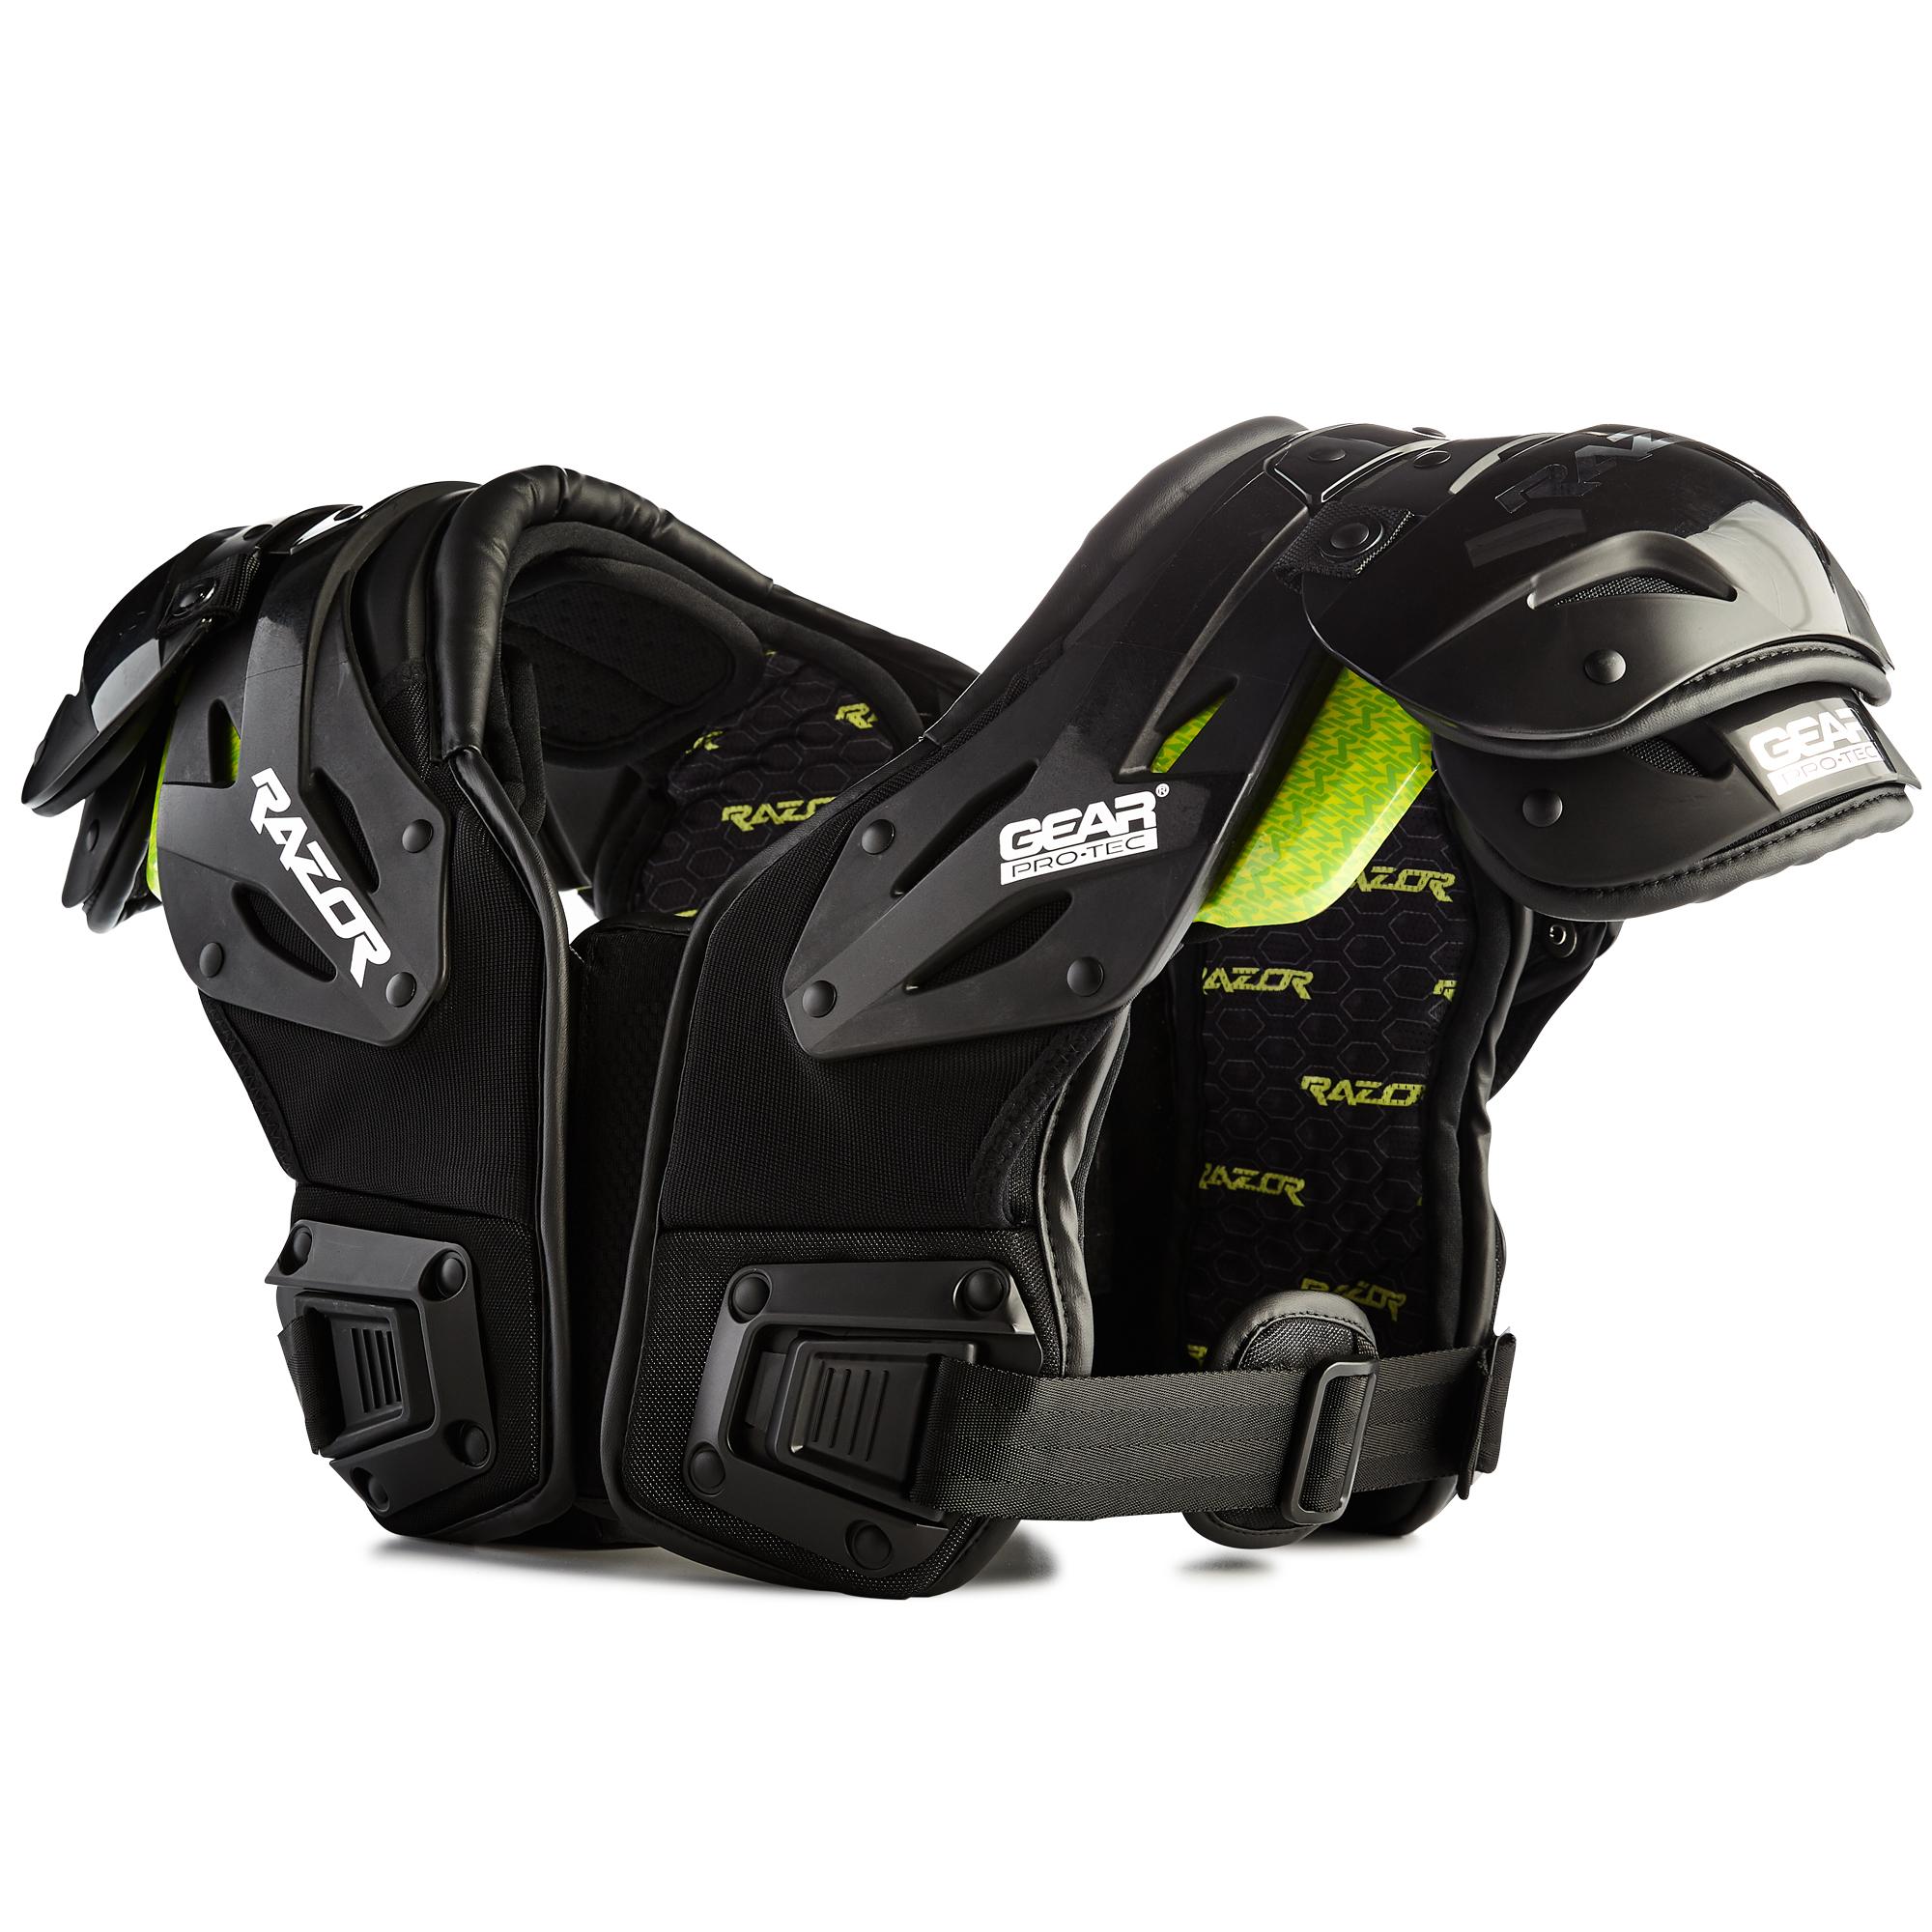 Gear Protec RZ7 Razor Shoulder Pad Skill Position